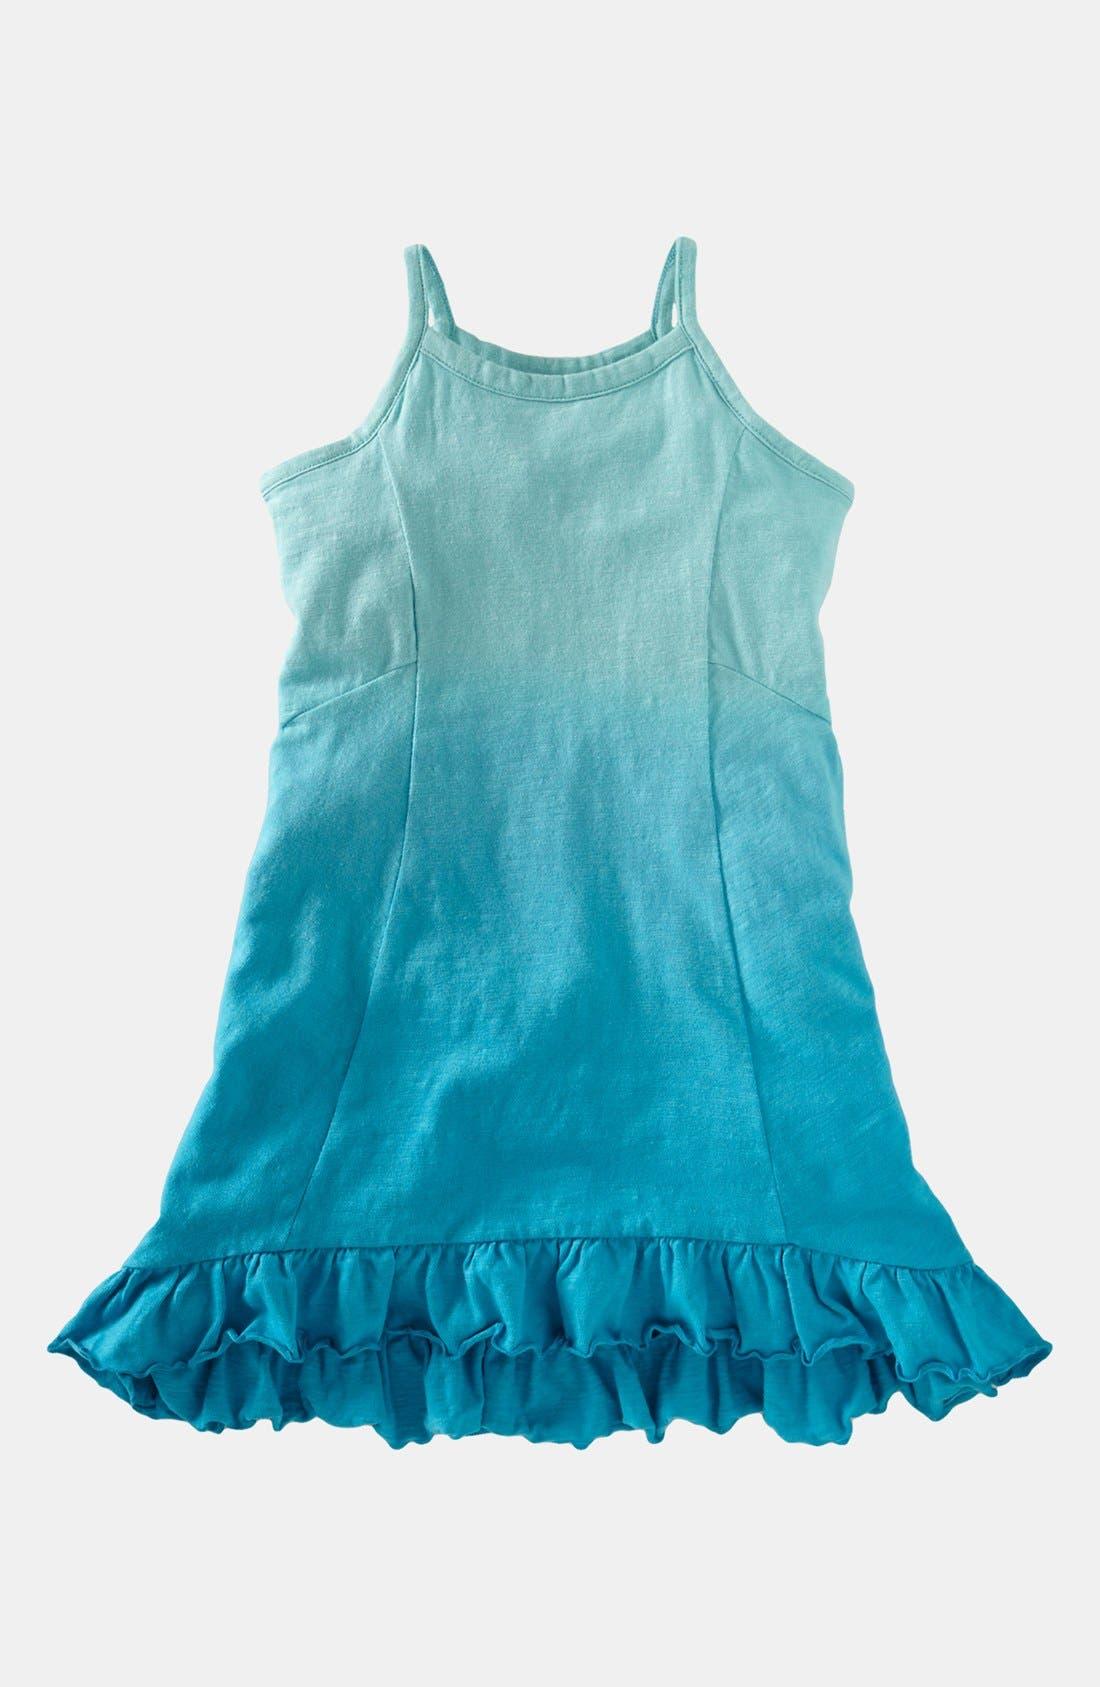 Main Image - Tea Collection 'Seafarer' Dress (Little Girls & Big Girls)